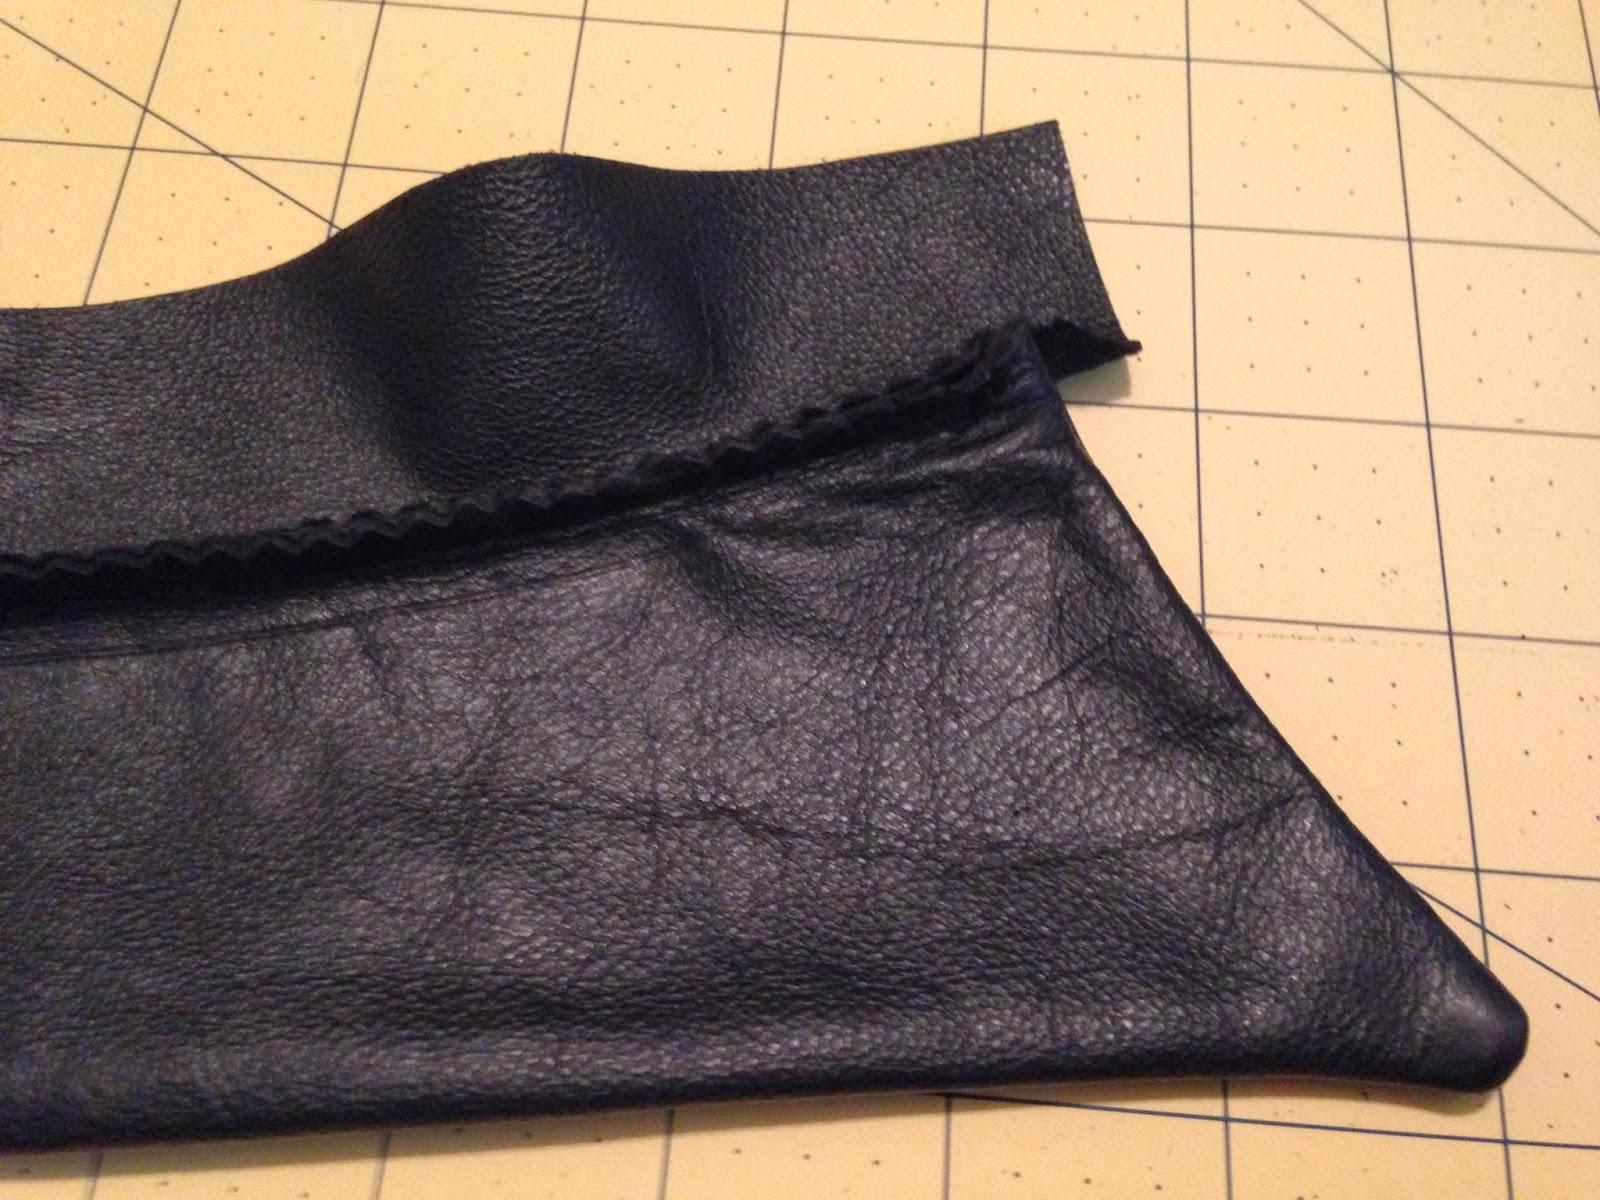 Ulterior Alterations: Removable Leather Collar DIY walk-thru